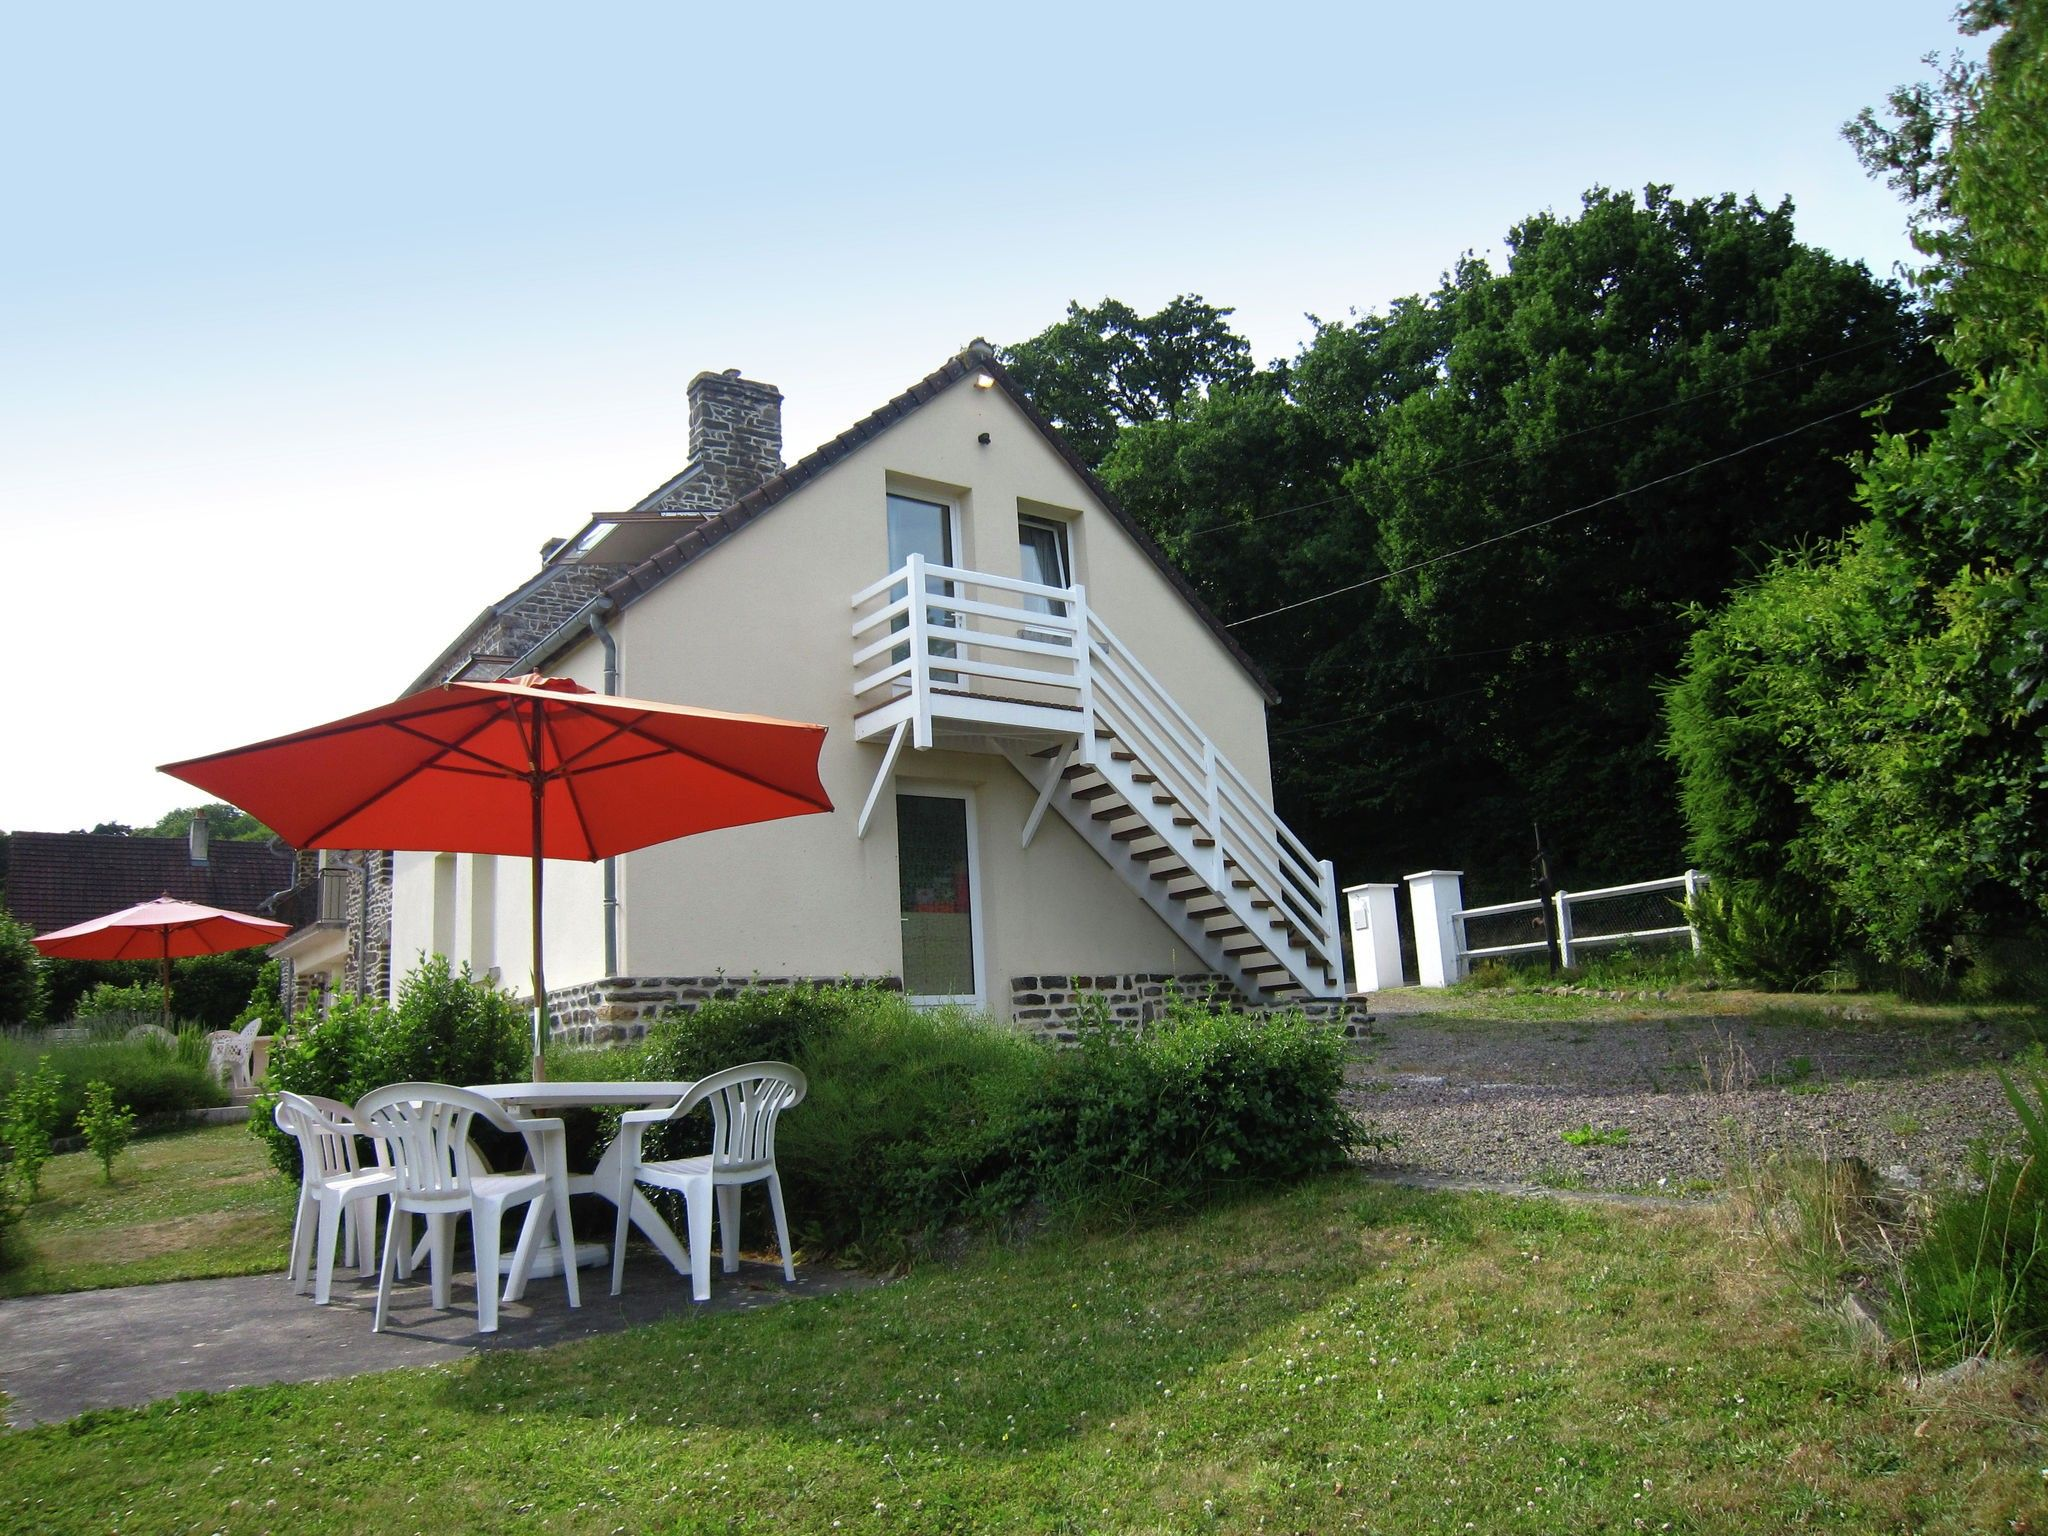 Hébergement de 52 m² à Lower normandy, calvados